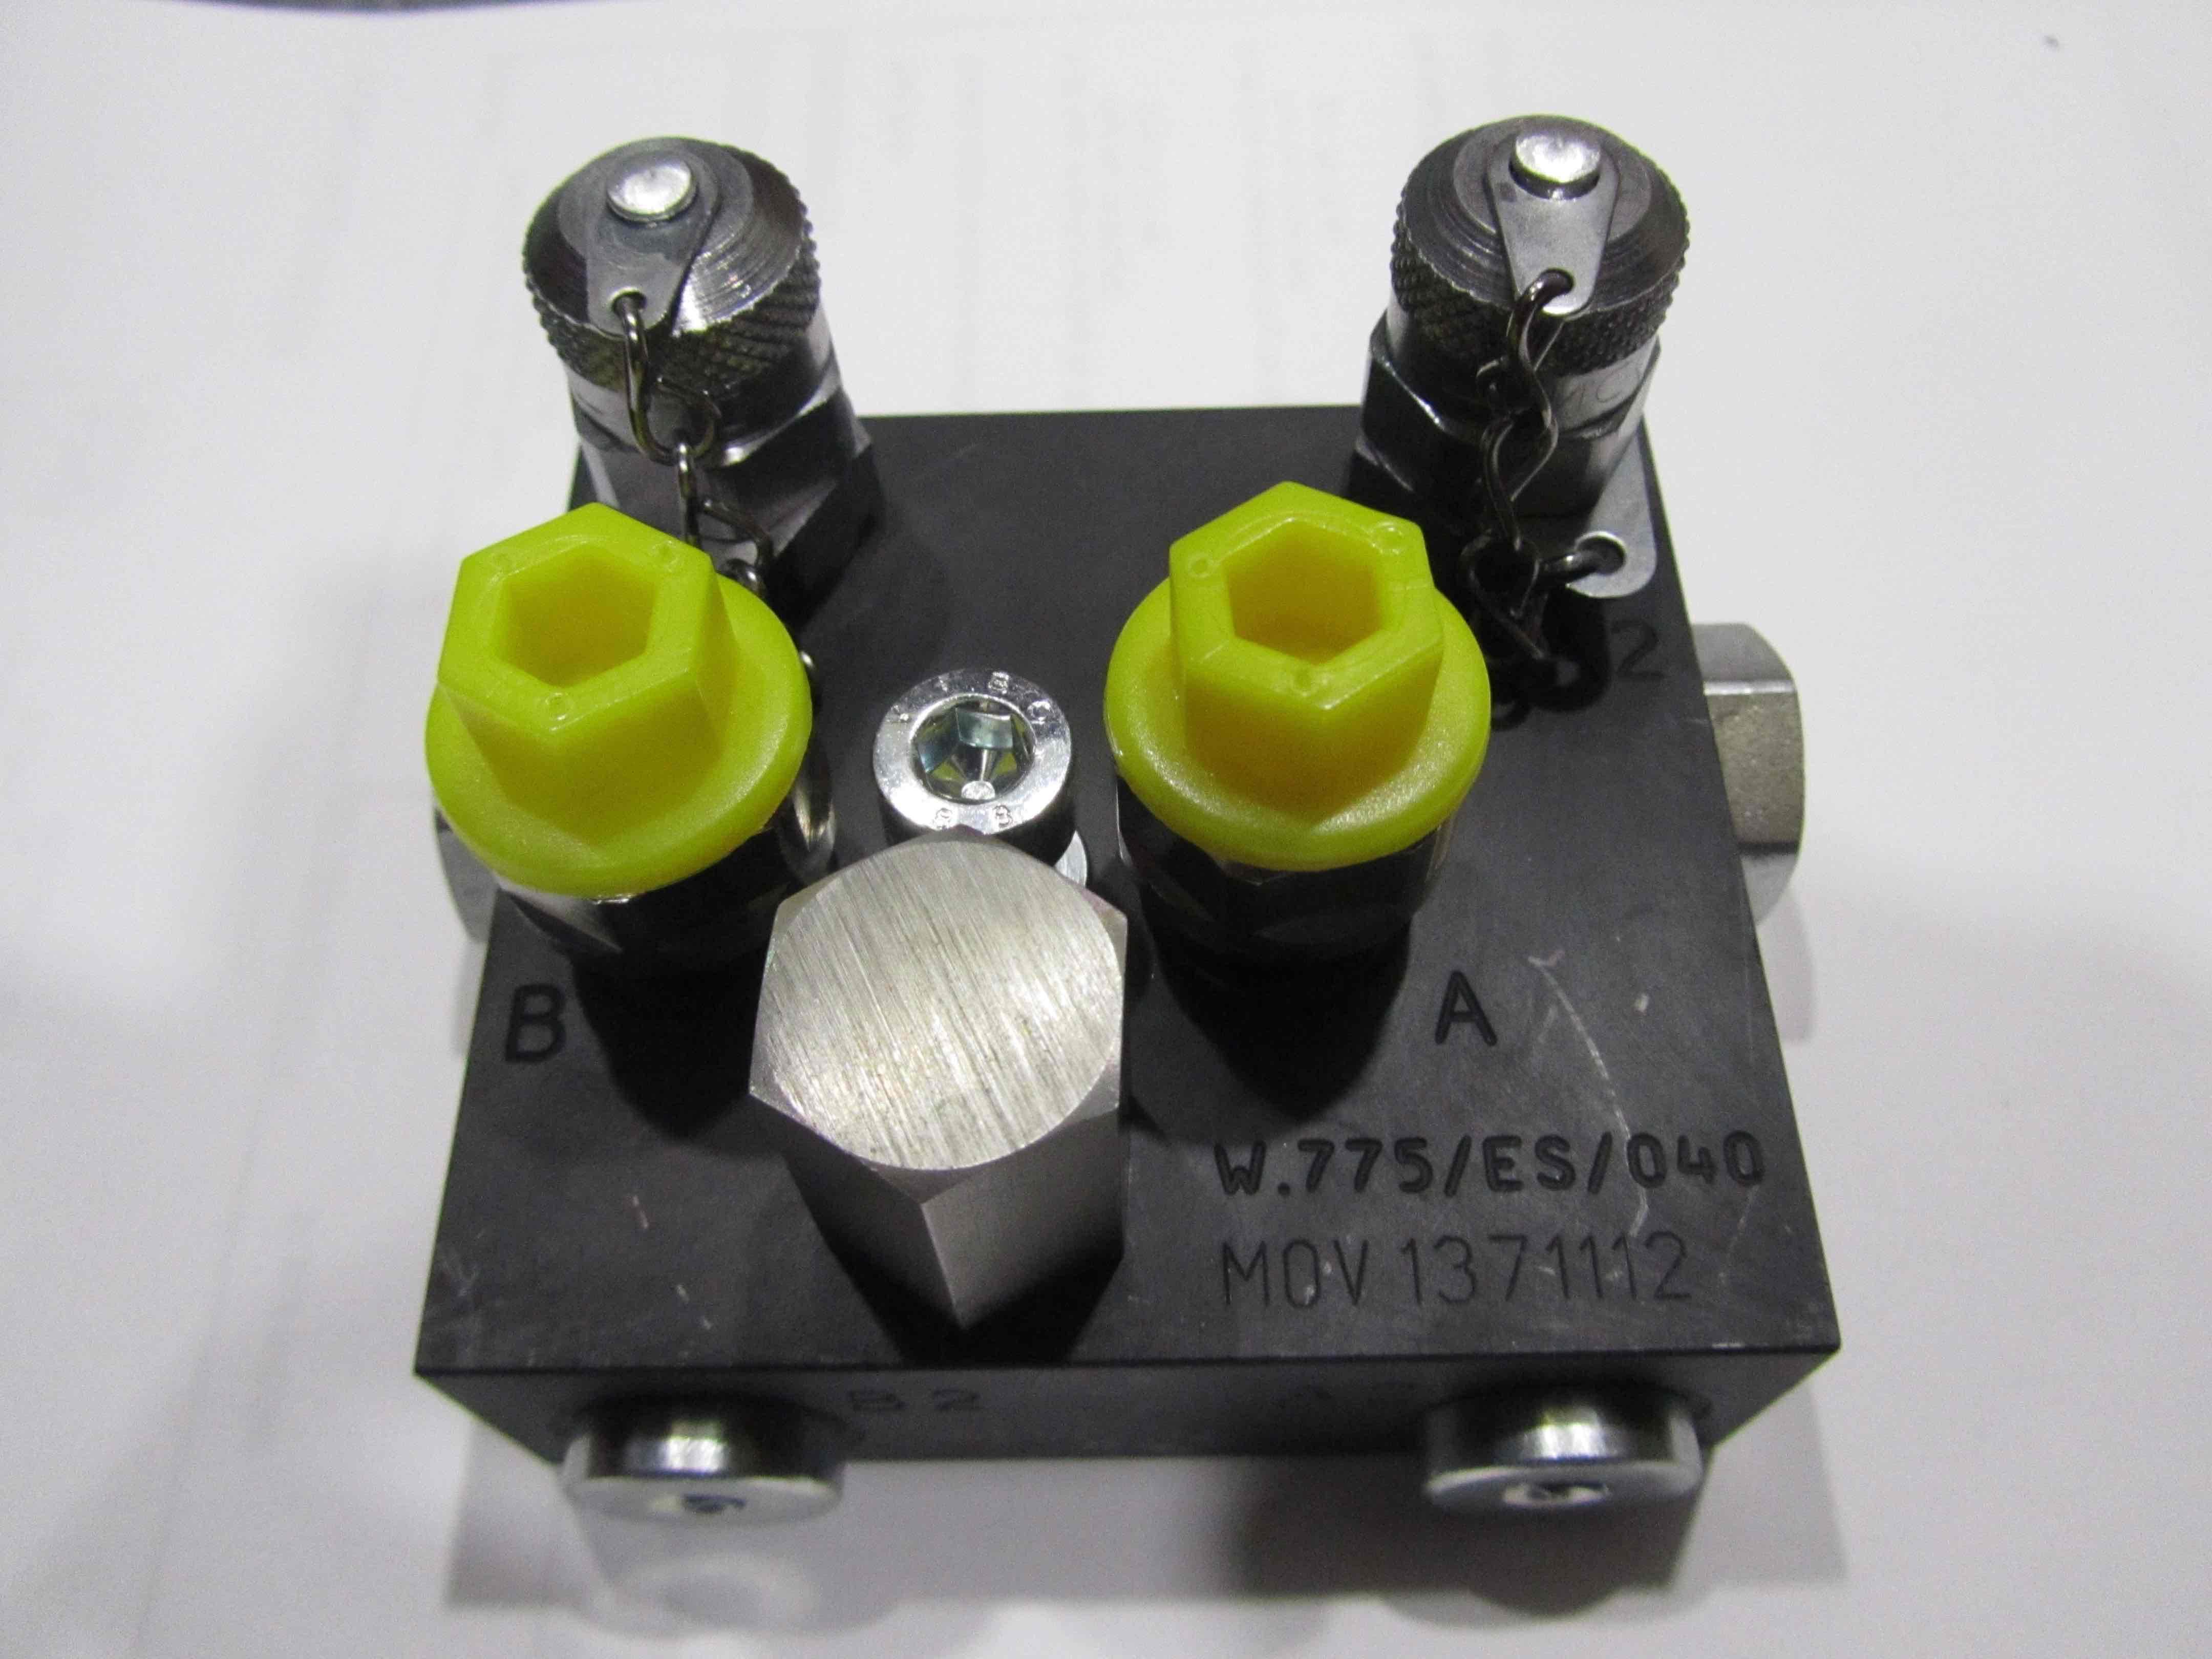 Medana & Visca W.775:ES:040 Control Block